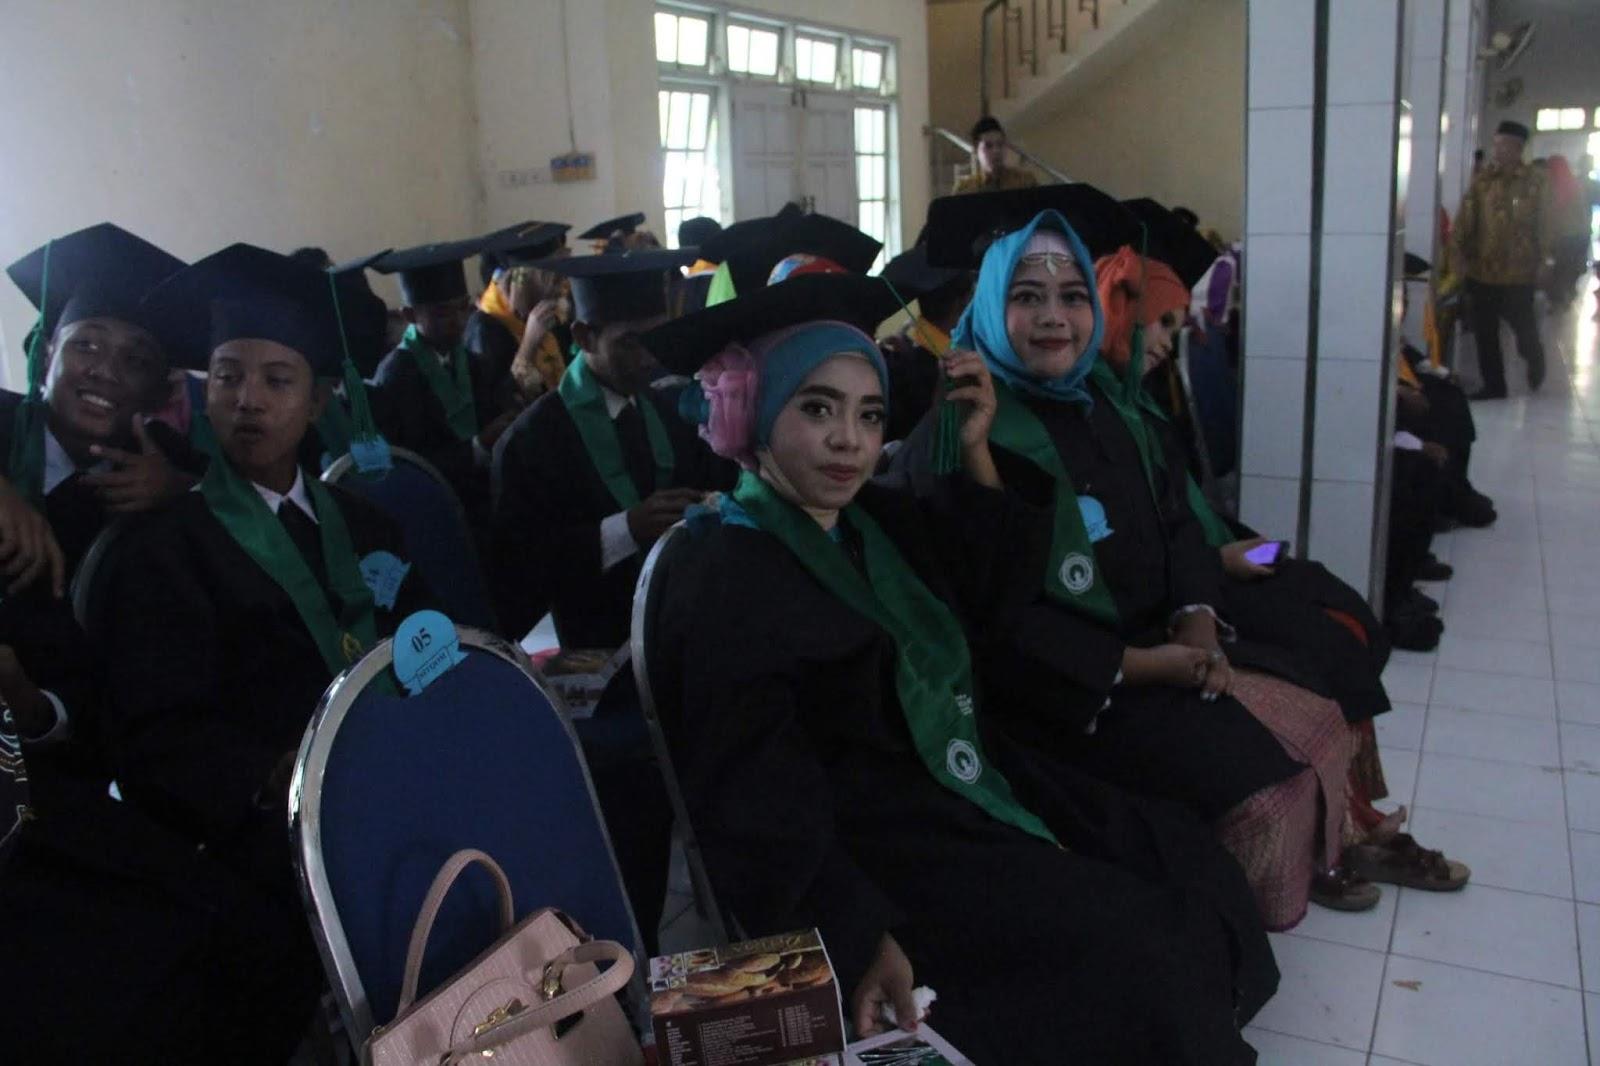 Herihasbullah Gengsi Vs Kualitas Diri Wah Si Nganu Damn I Love Indonesia Kaos Pria Principal Box Off White Putih L Baru Lulus Kuliah Atau Tamat Sekolah Masih Nganggur Begitulah Pertanyaan Yang Kerap Muncul Pusingnya Gak Terlalu Sih Cuma Dan Malu Kalo Di